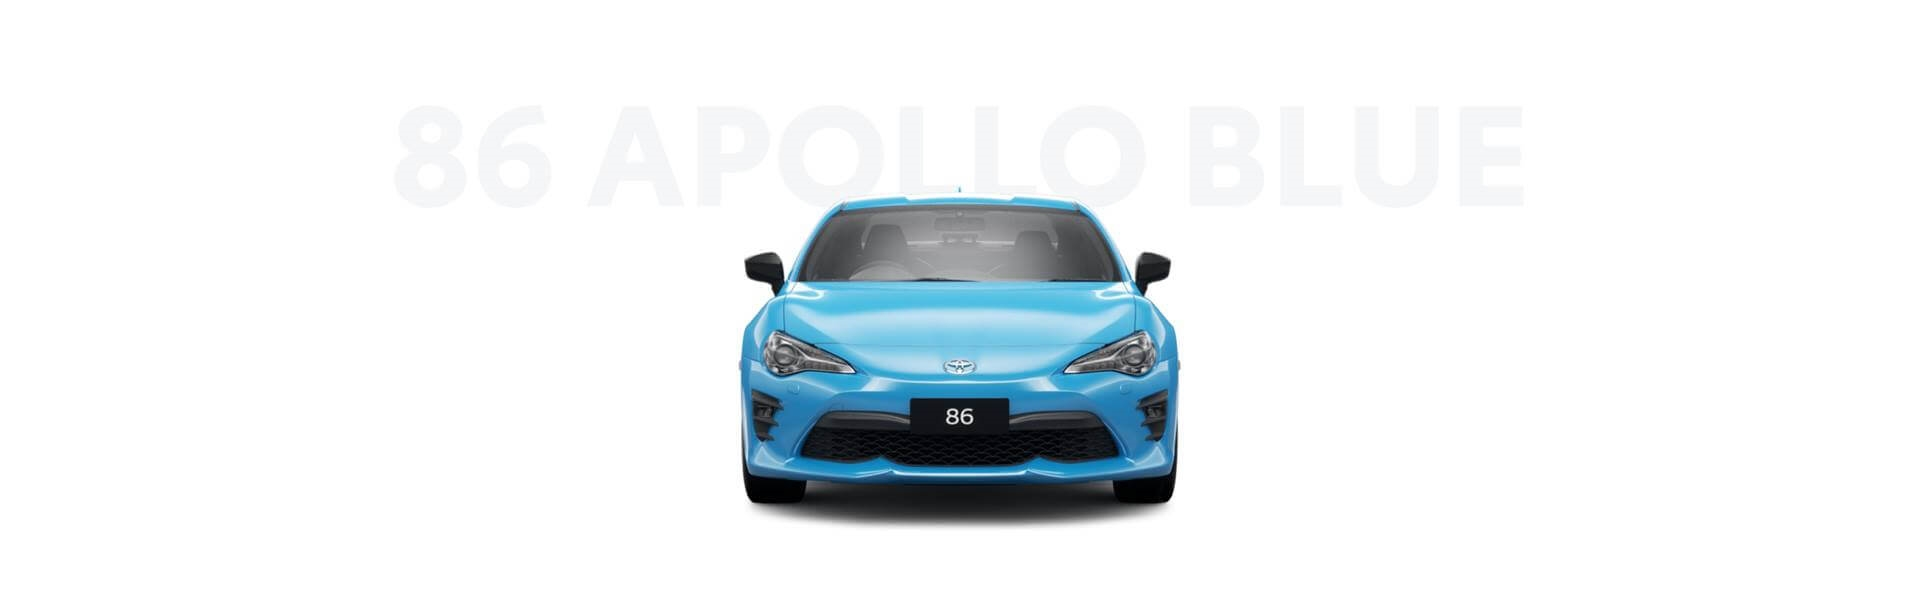 86 Apollo Blue